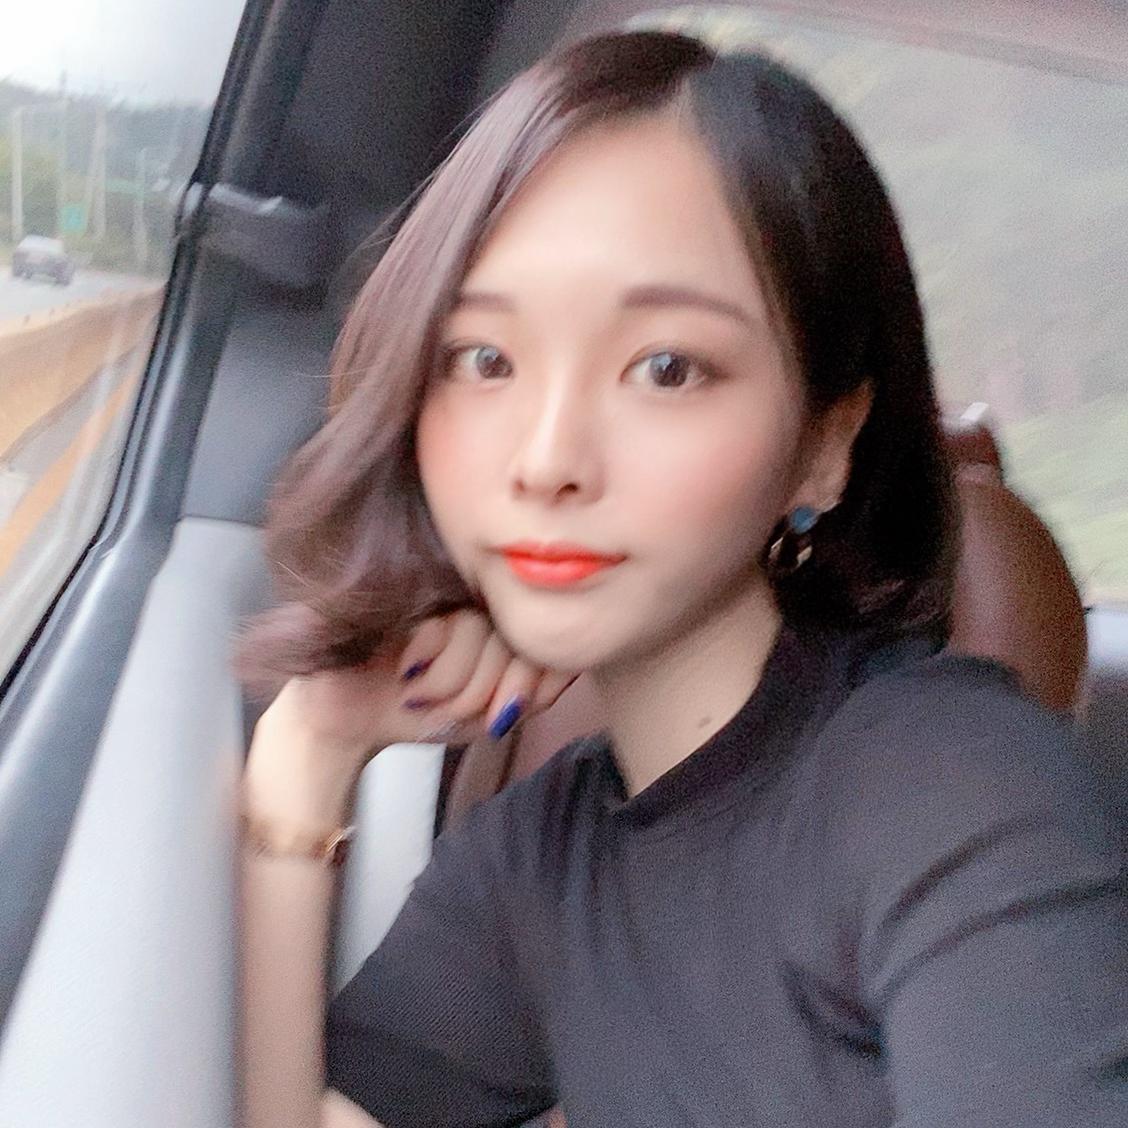 hyunsaeng님의 댓글